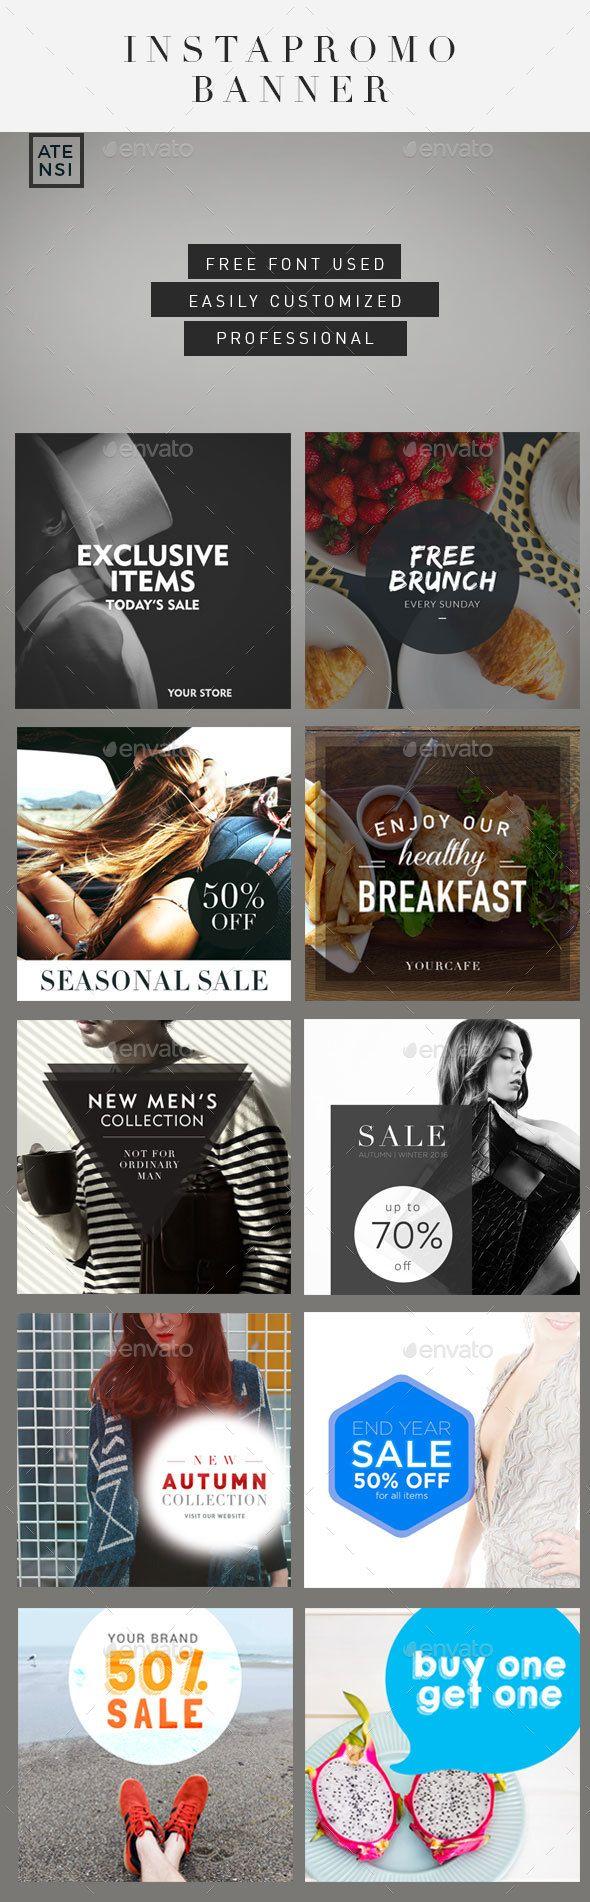 Instagram Promo Banner - Social Media Web Elements